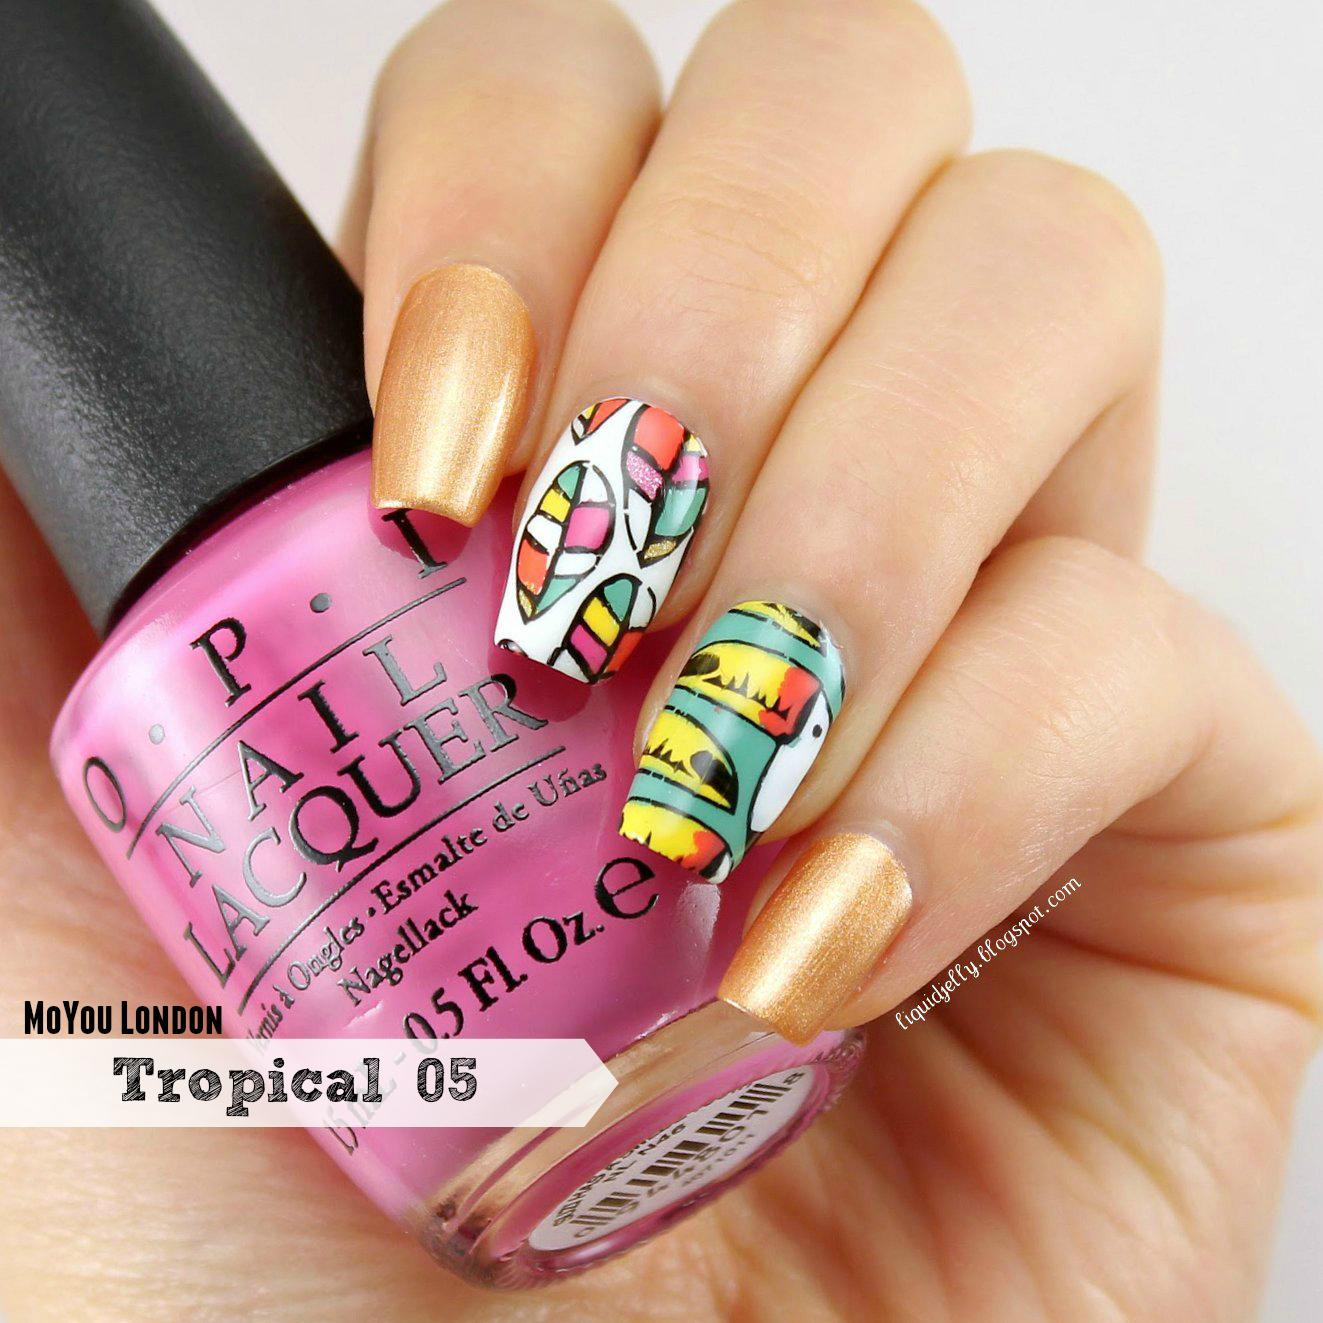 Nail Art] MoYou London Tropical 05   Liquid Jelly   Bloglovin\'